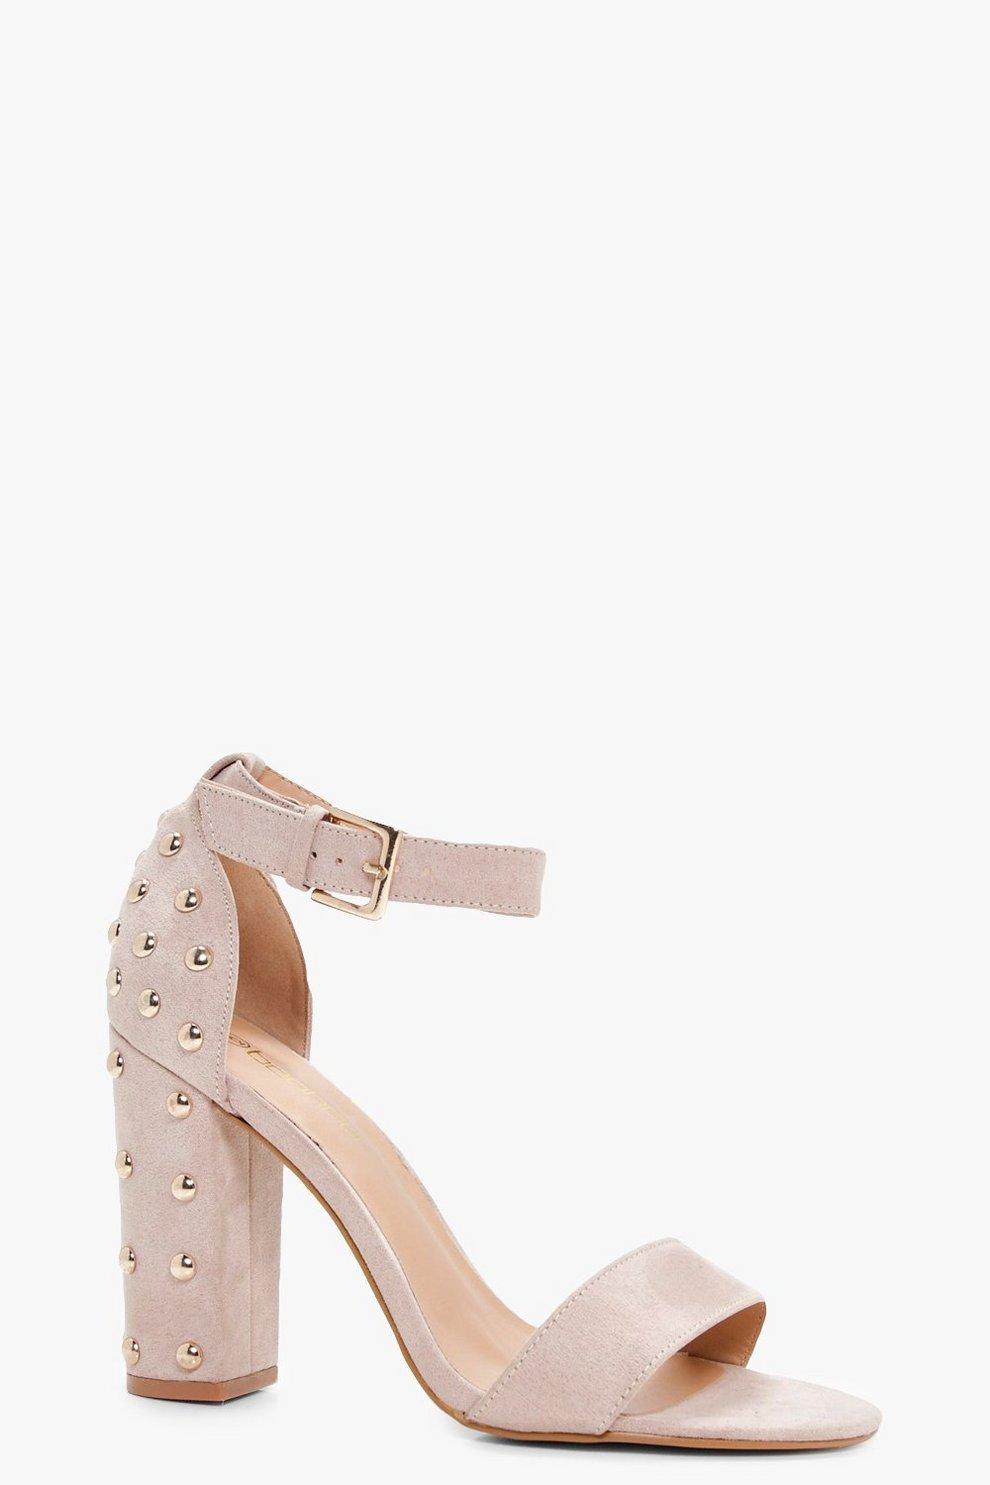 75400b9529d Studded Back Two Part Block Heels